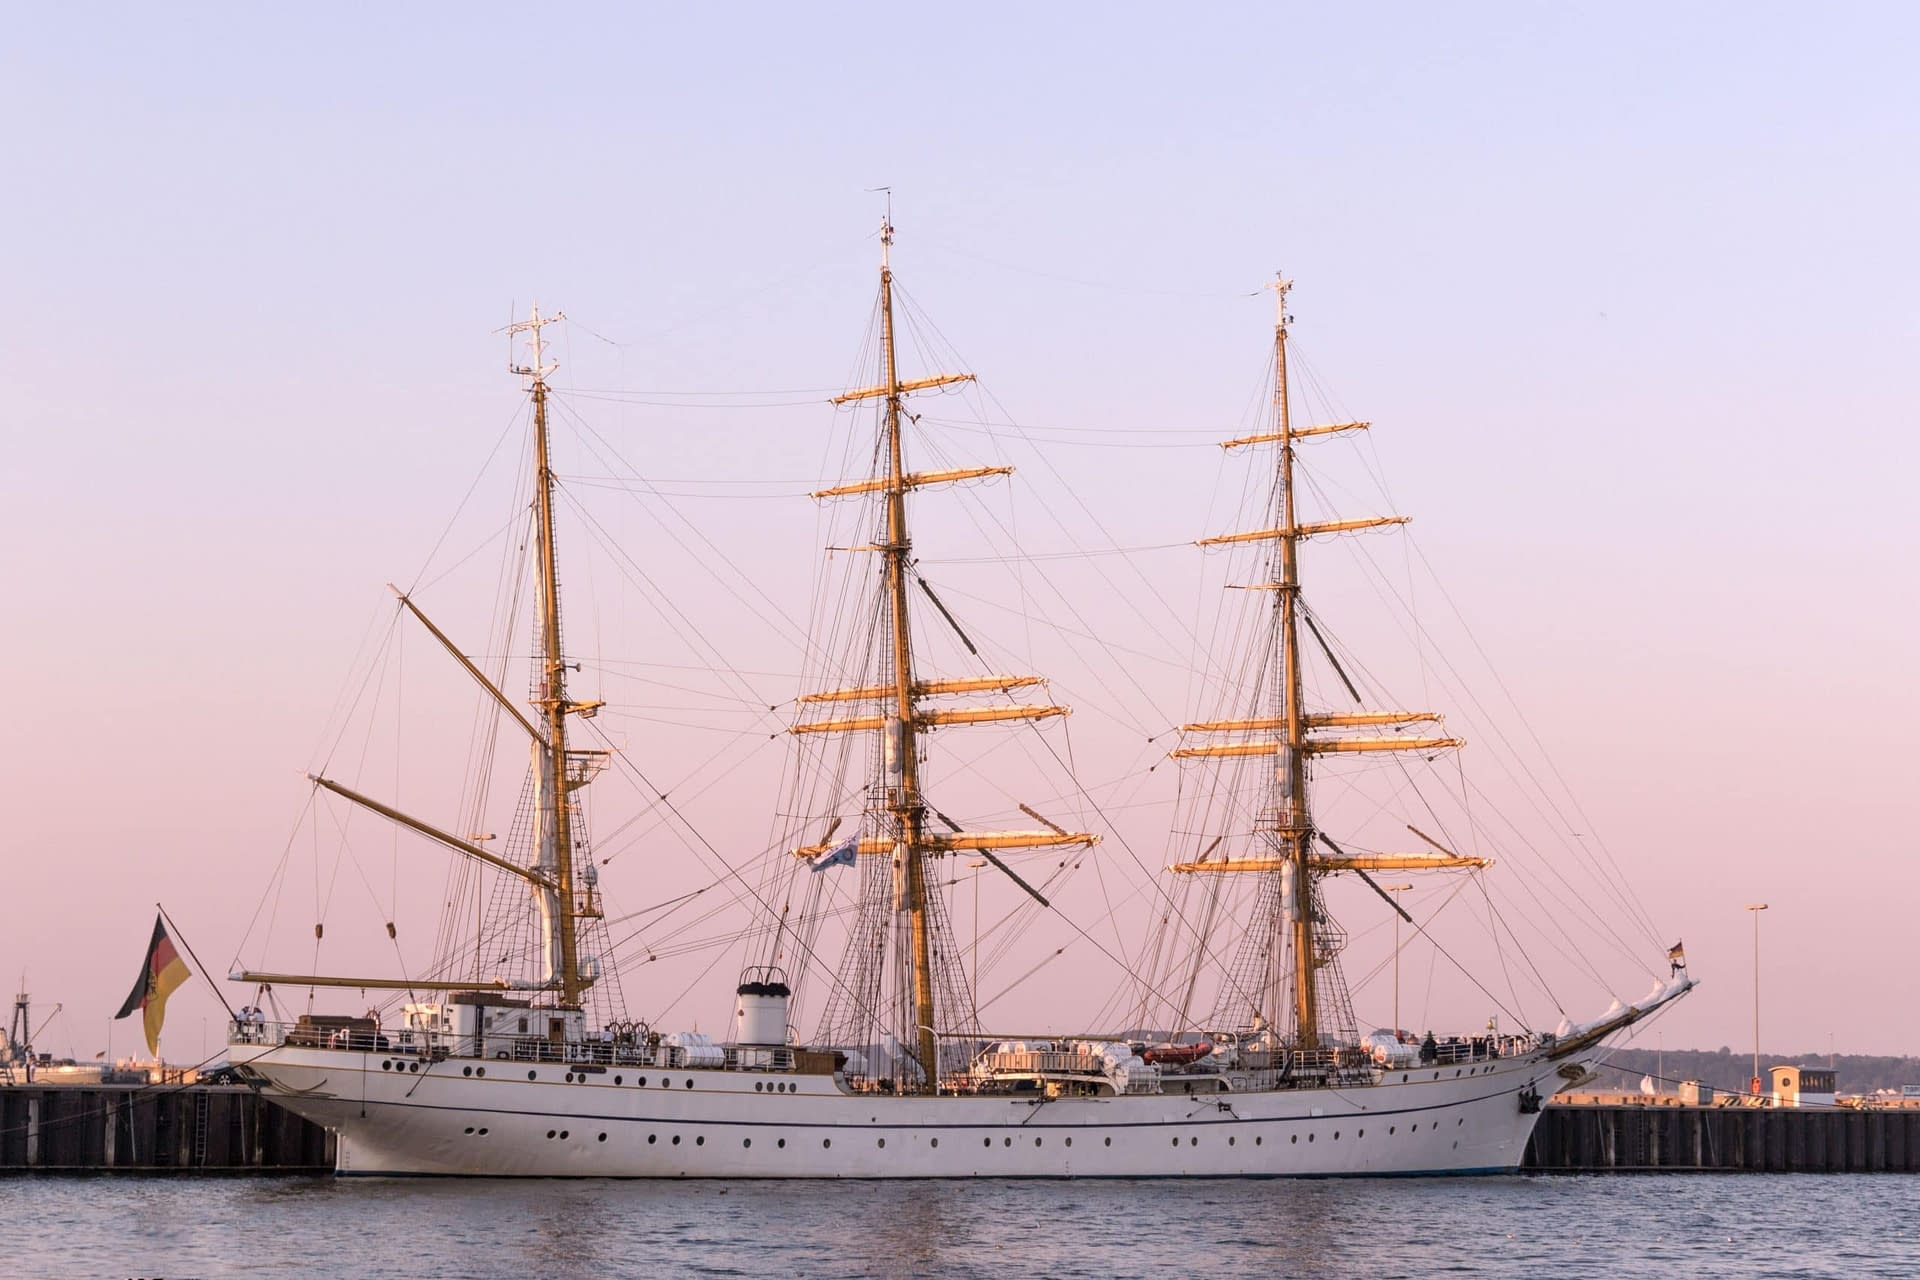 Case Study | Suspicion of corruption in the renovation of the sailing training ship Gorch Fock